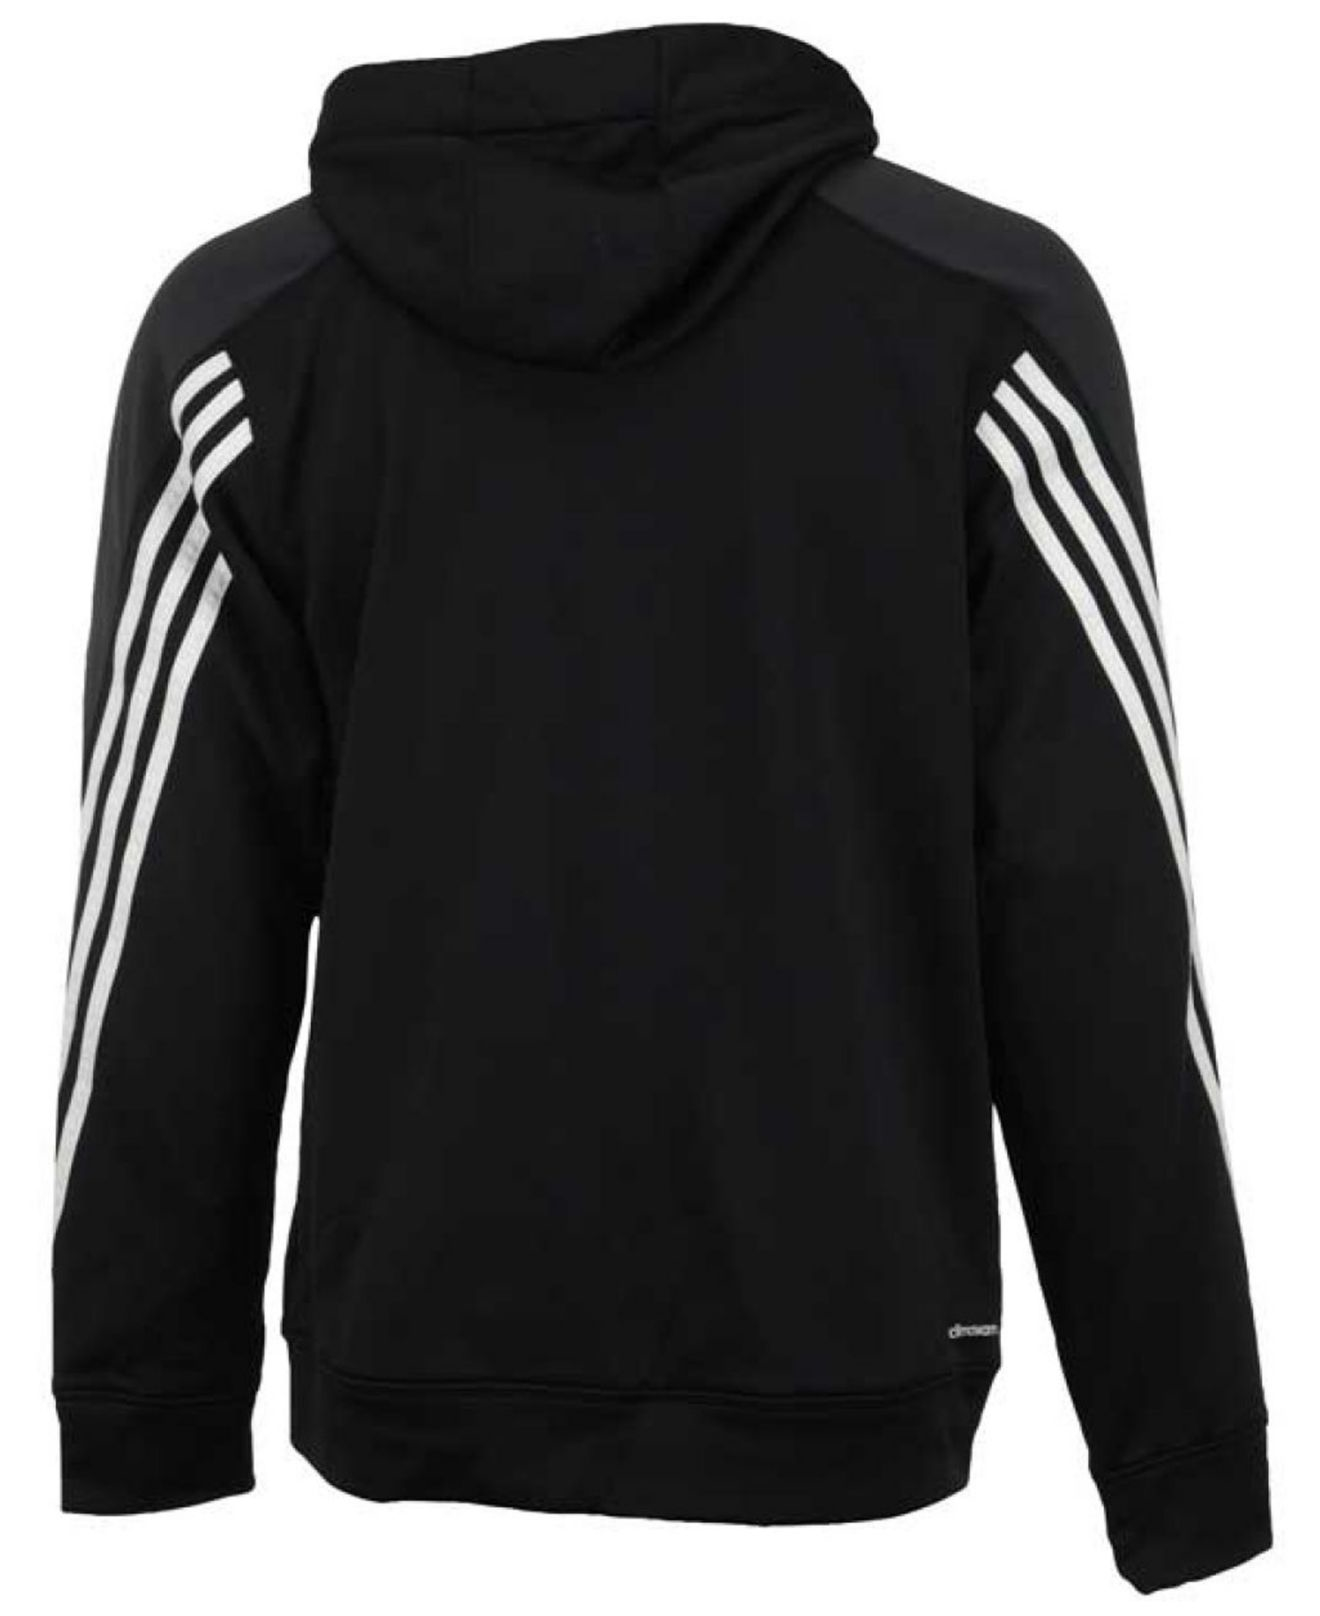 Adidas Originals Men's Portland Trail Blazers On